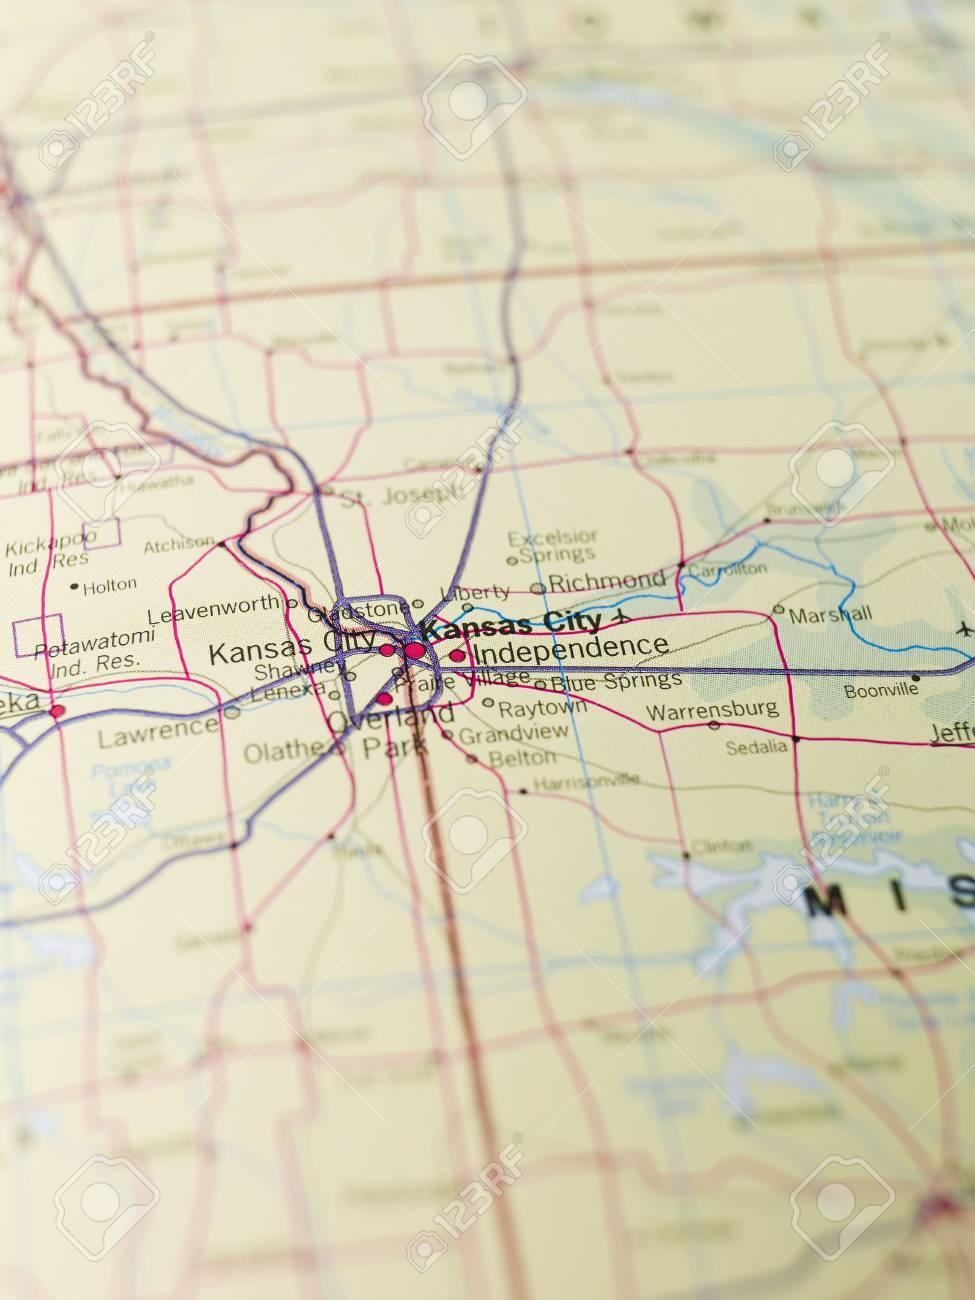 Map of Kansas City in USA